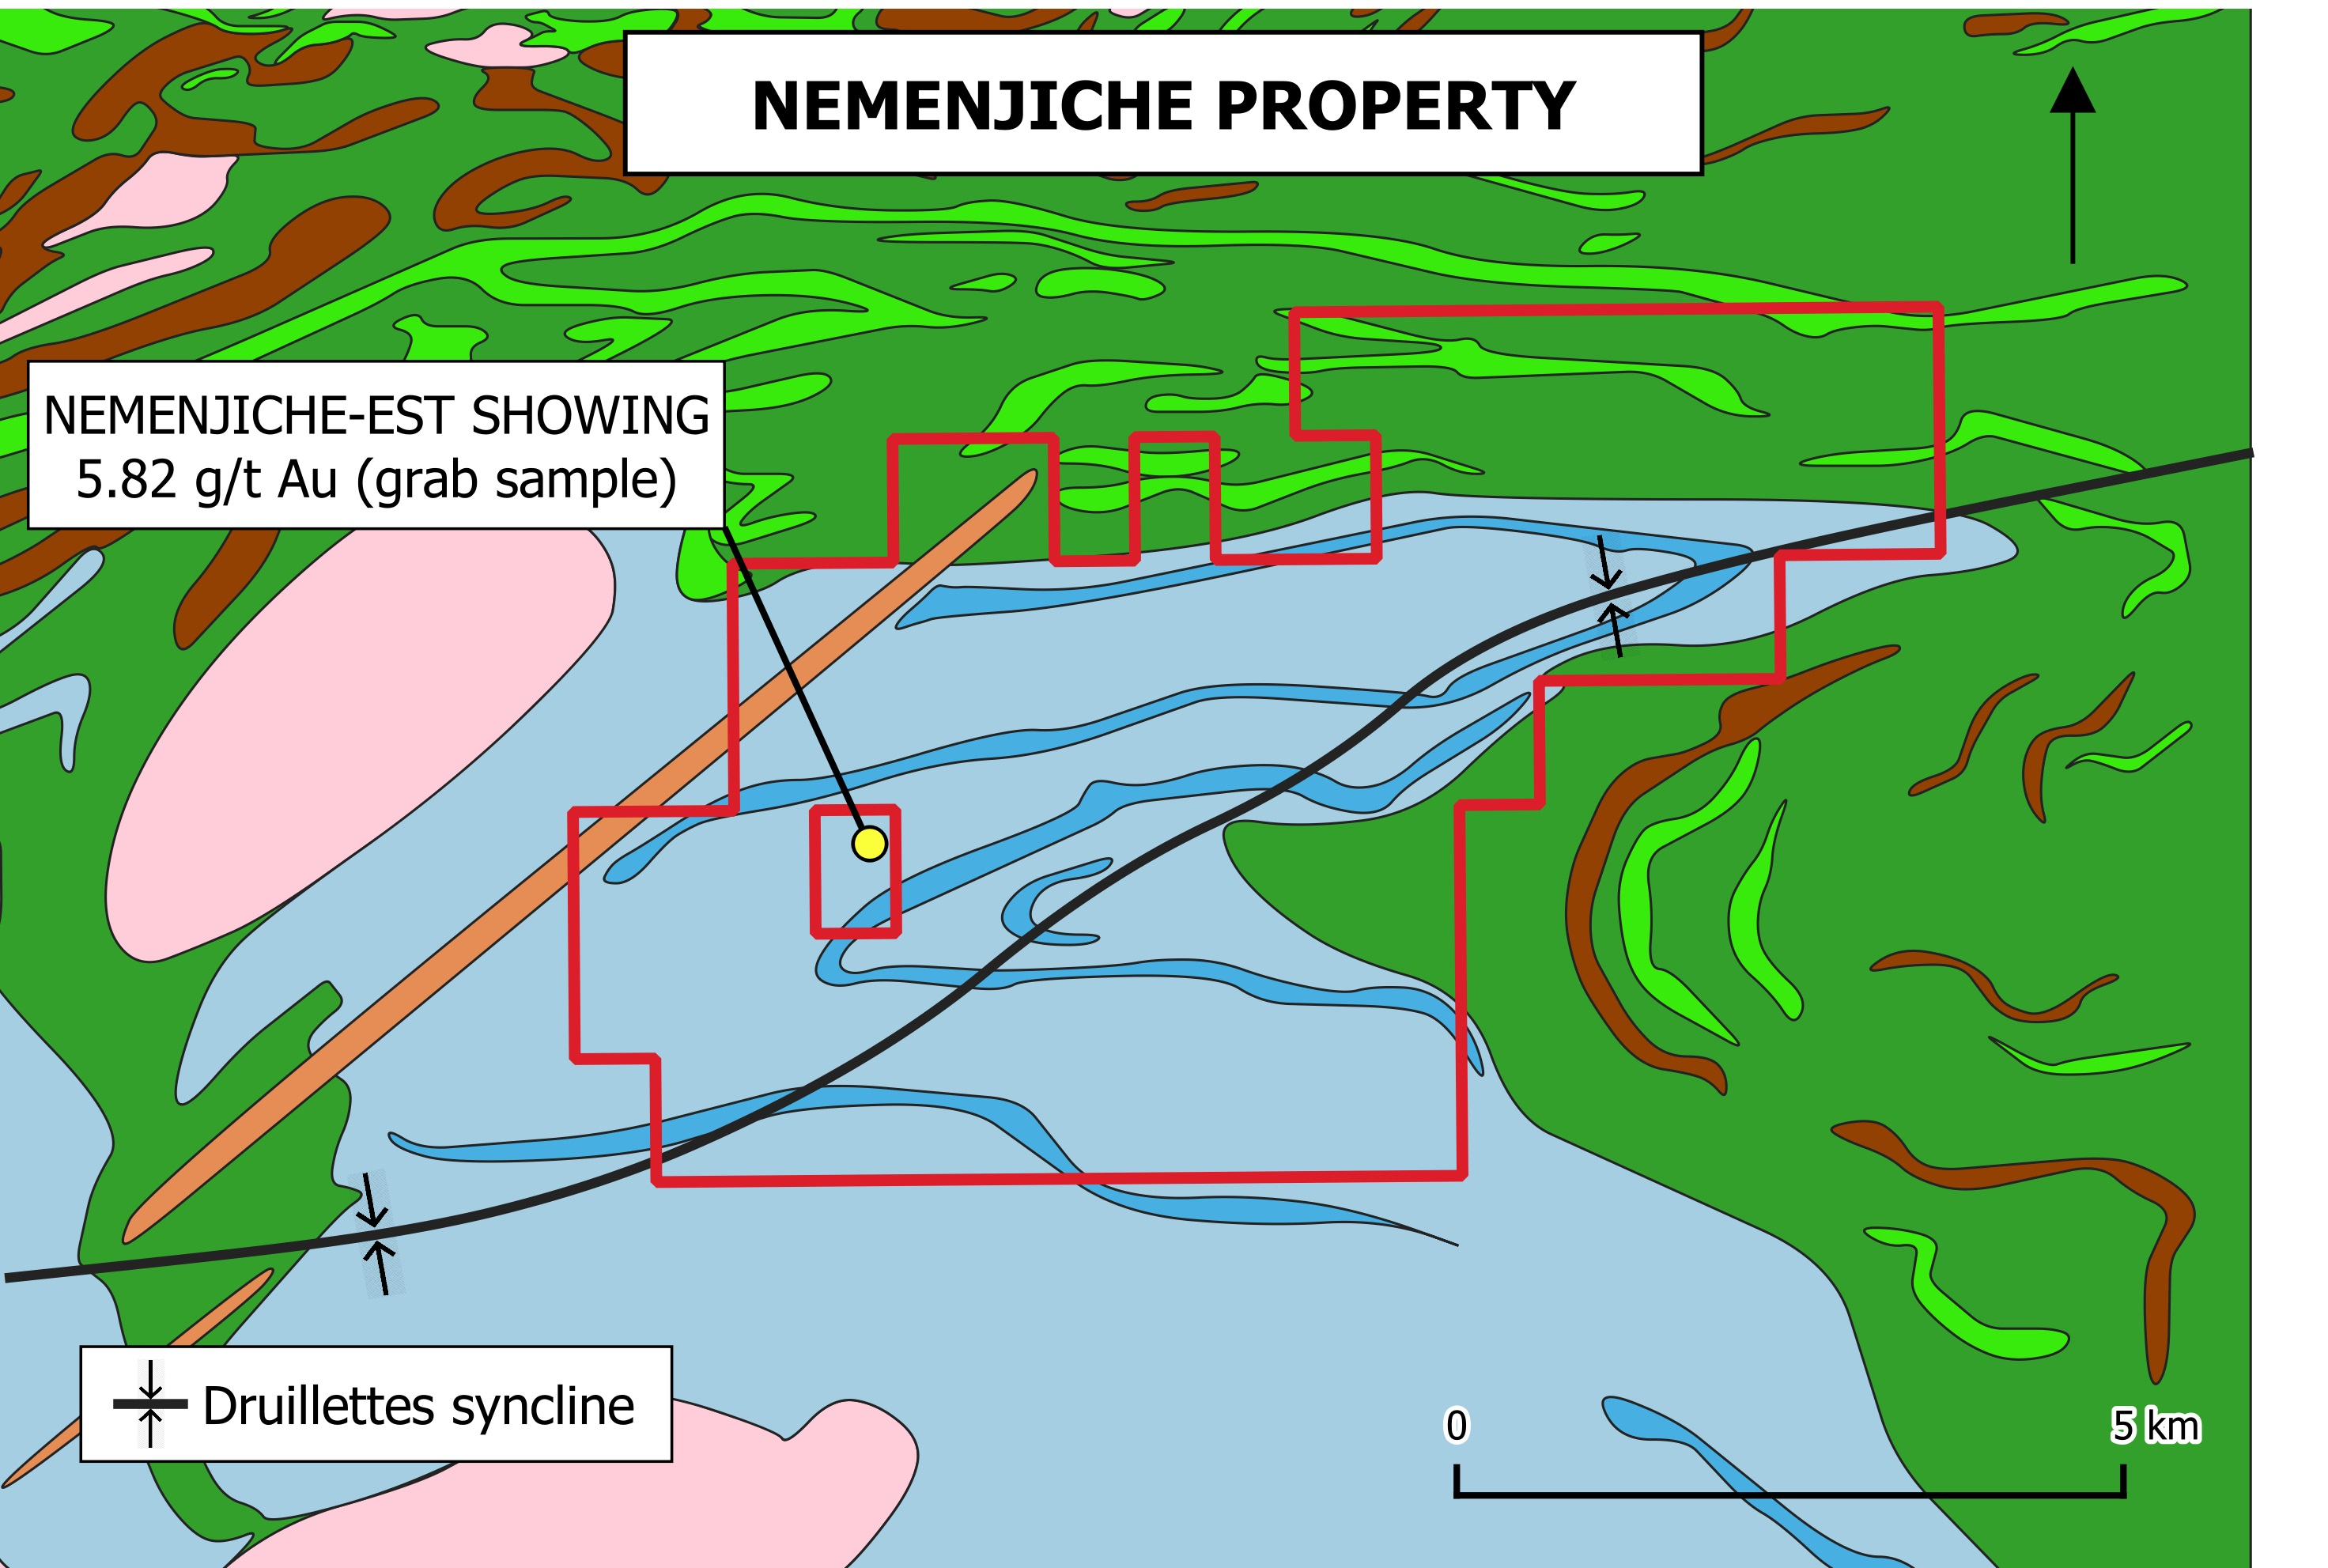 Nemenjiche Regional Map